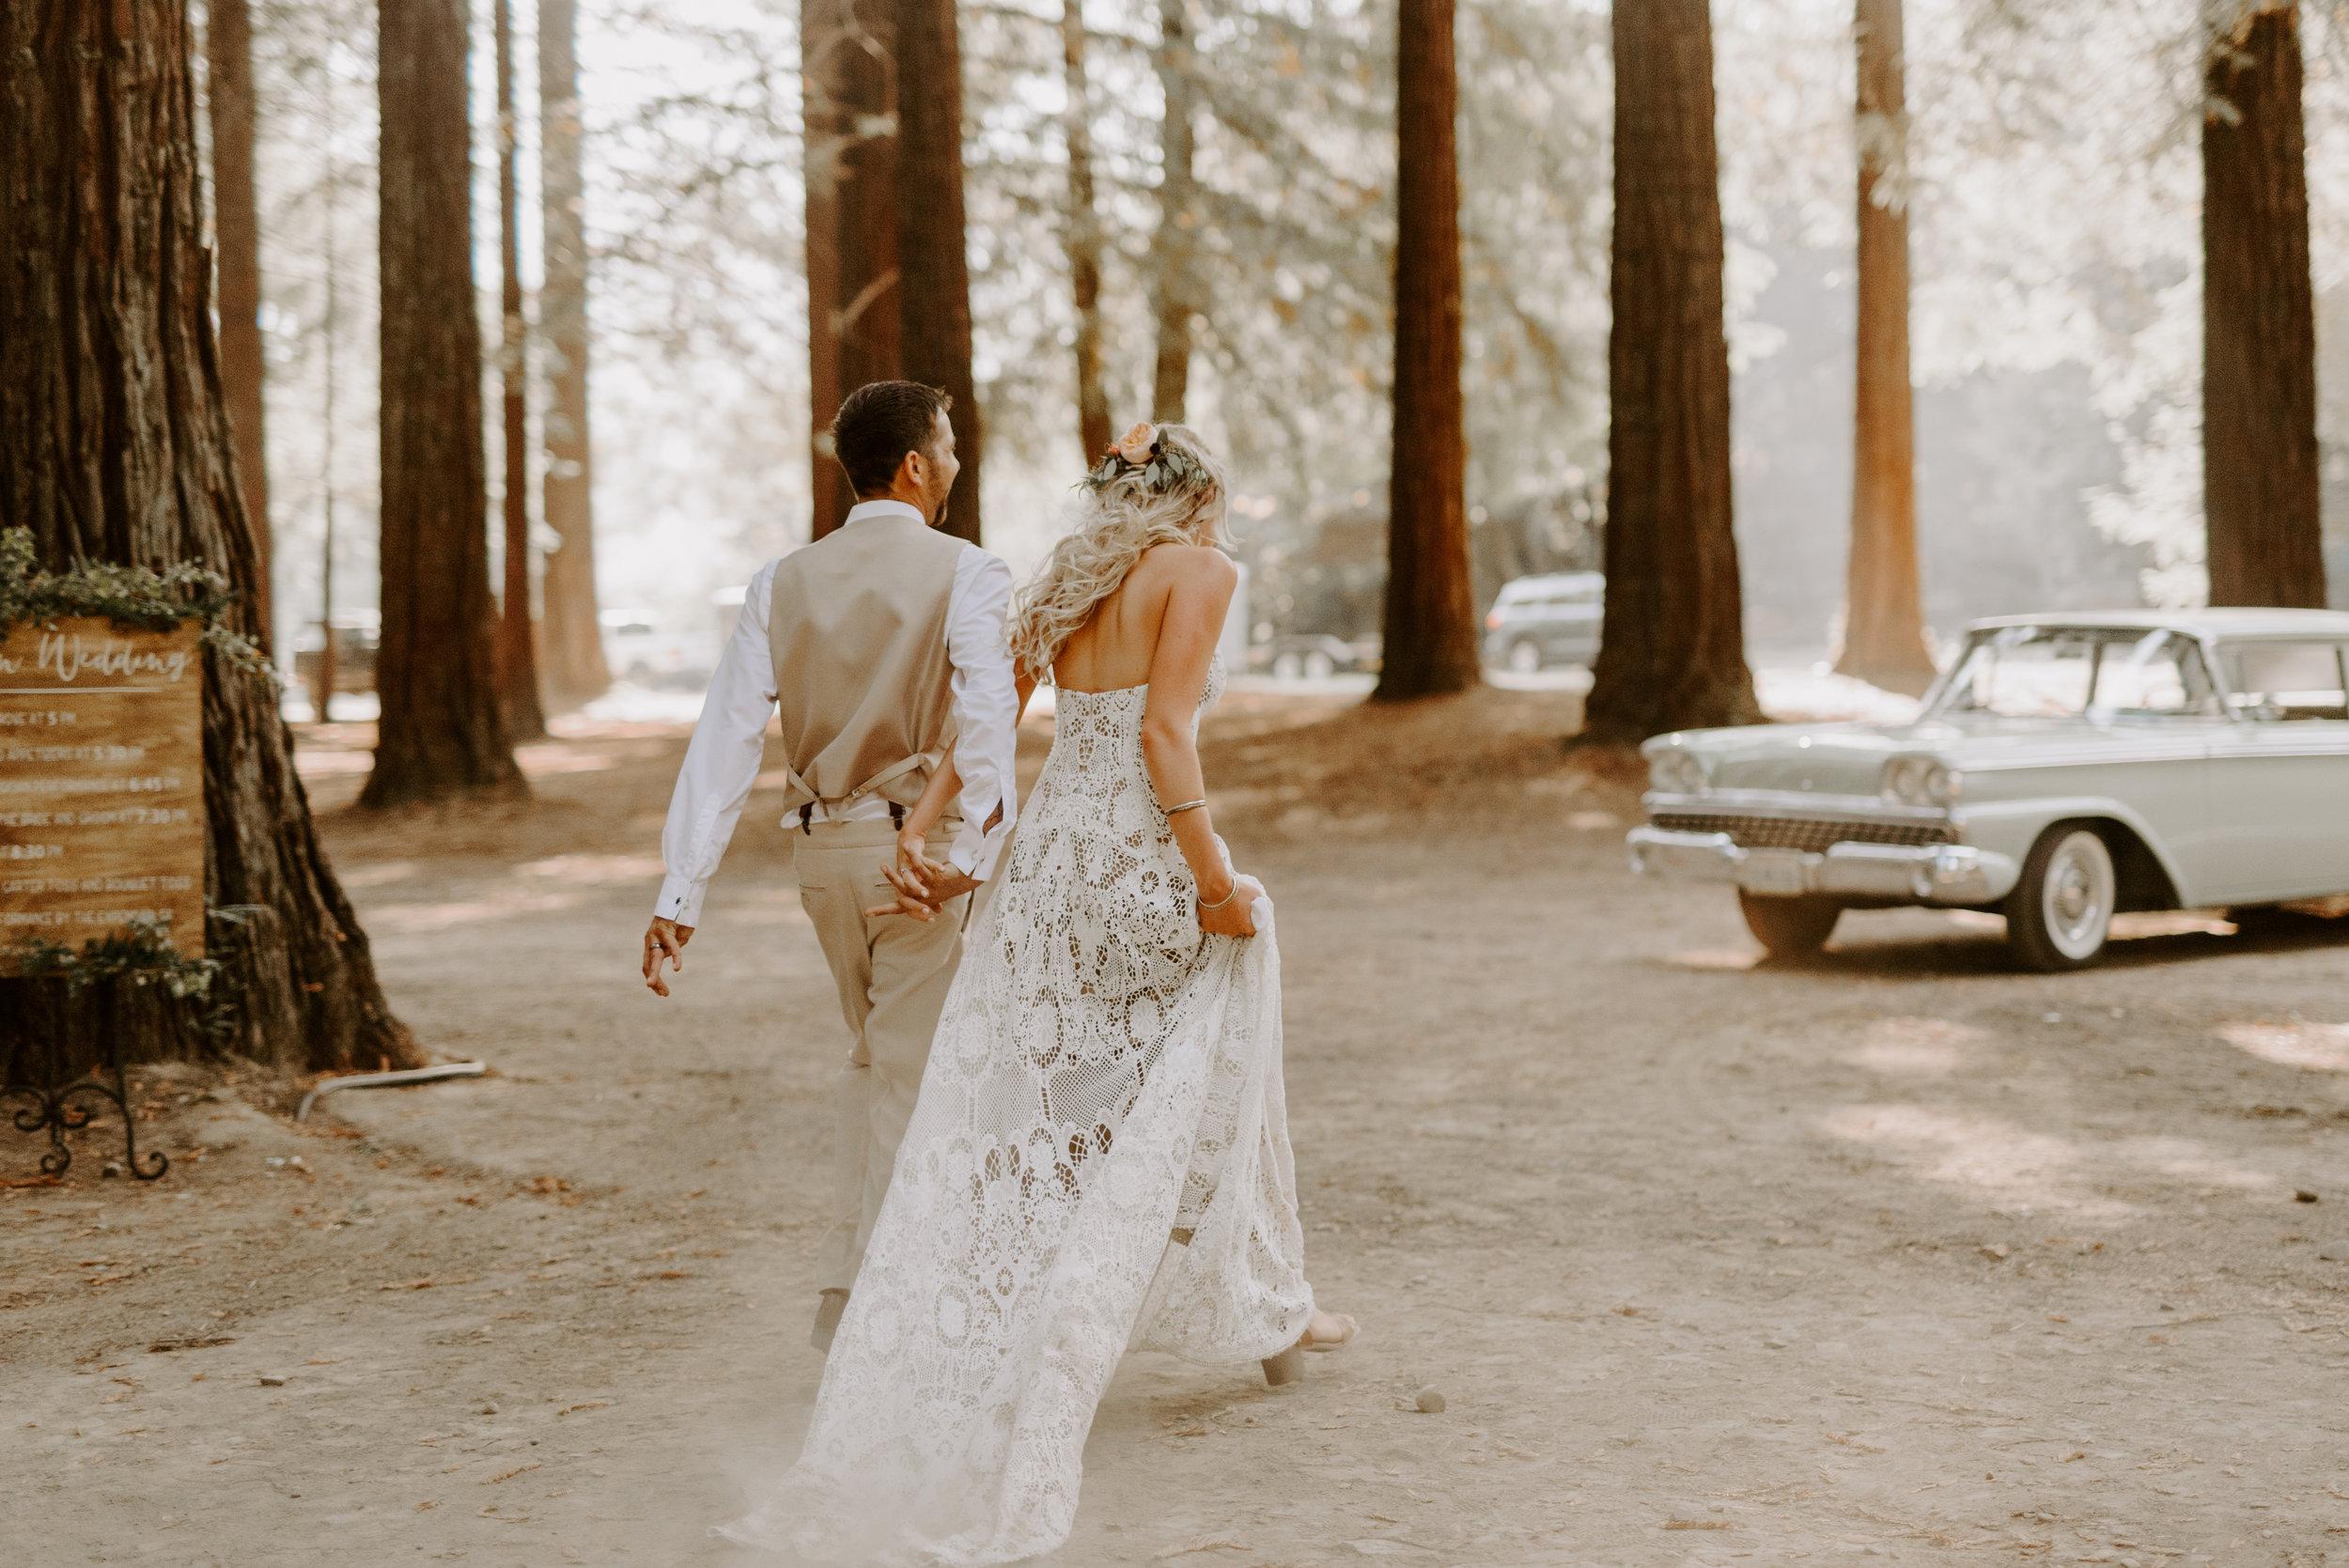 Festival Themed Wedding in the Redwoods -